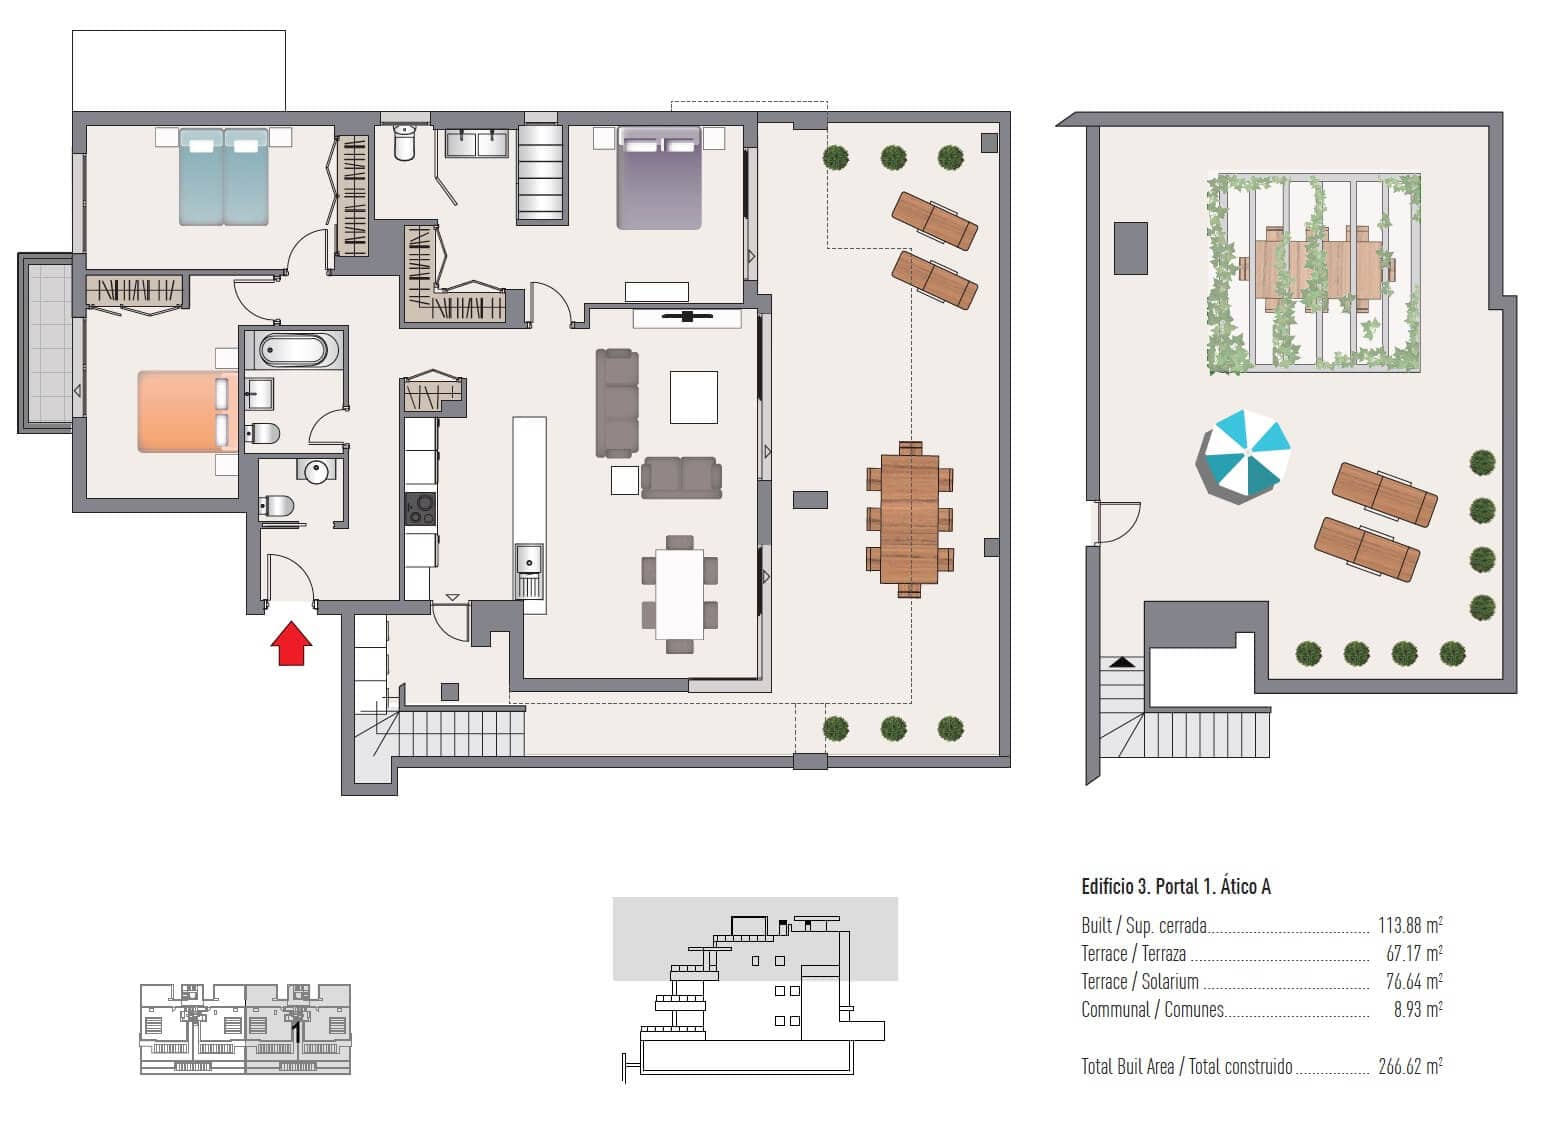 las olas estepona appartement te koop grondplan penthouse 2 slaapkamers